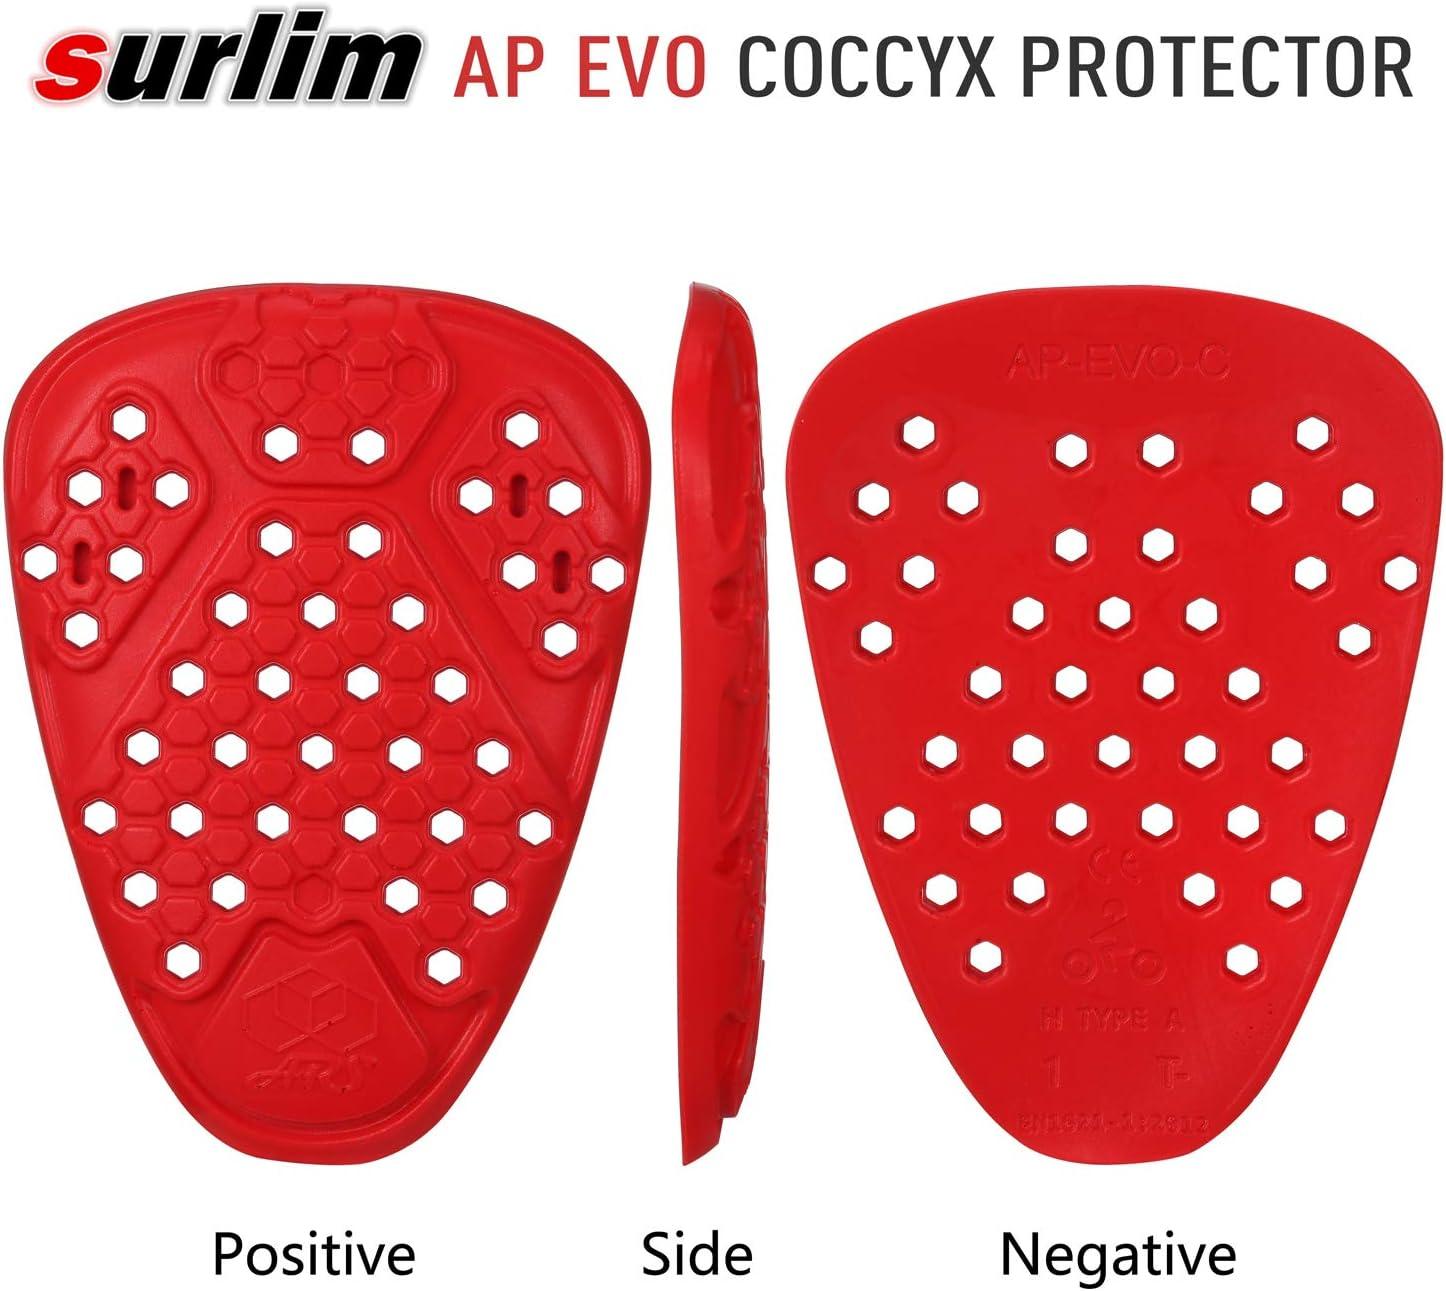 ARS  AP-EVO Replacement Coccyx Pad EN1621-1:2012 Level 1 Protection Orange